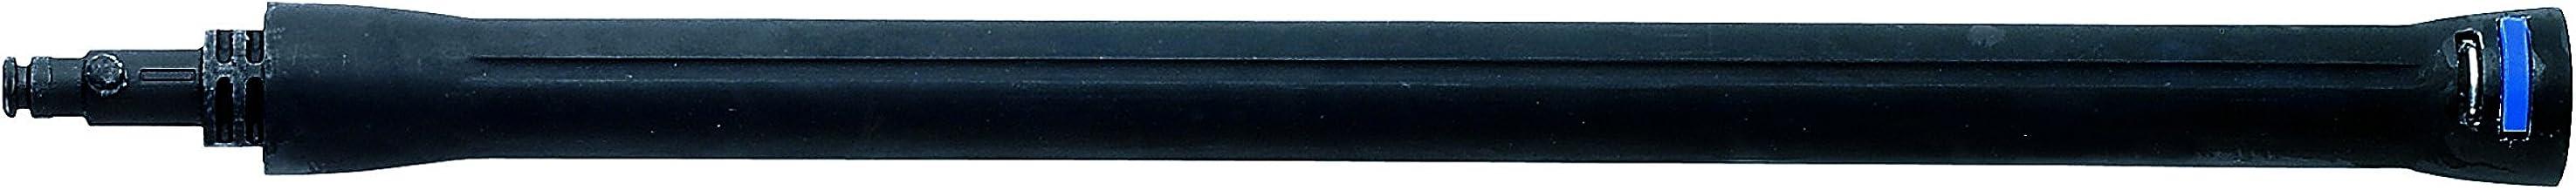 Nilfisk Blauw Alto 128500074 G4 Click en Clean Spray Lance Lang